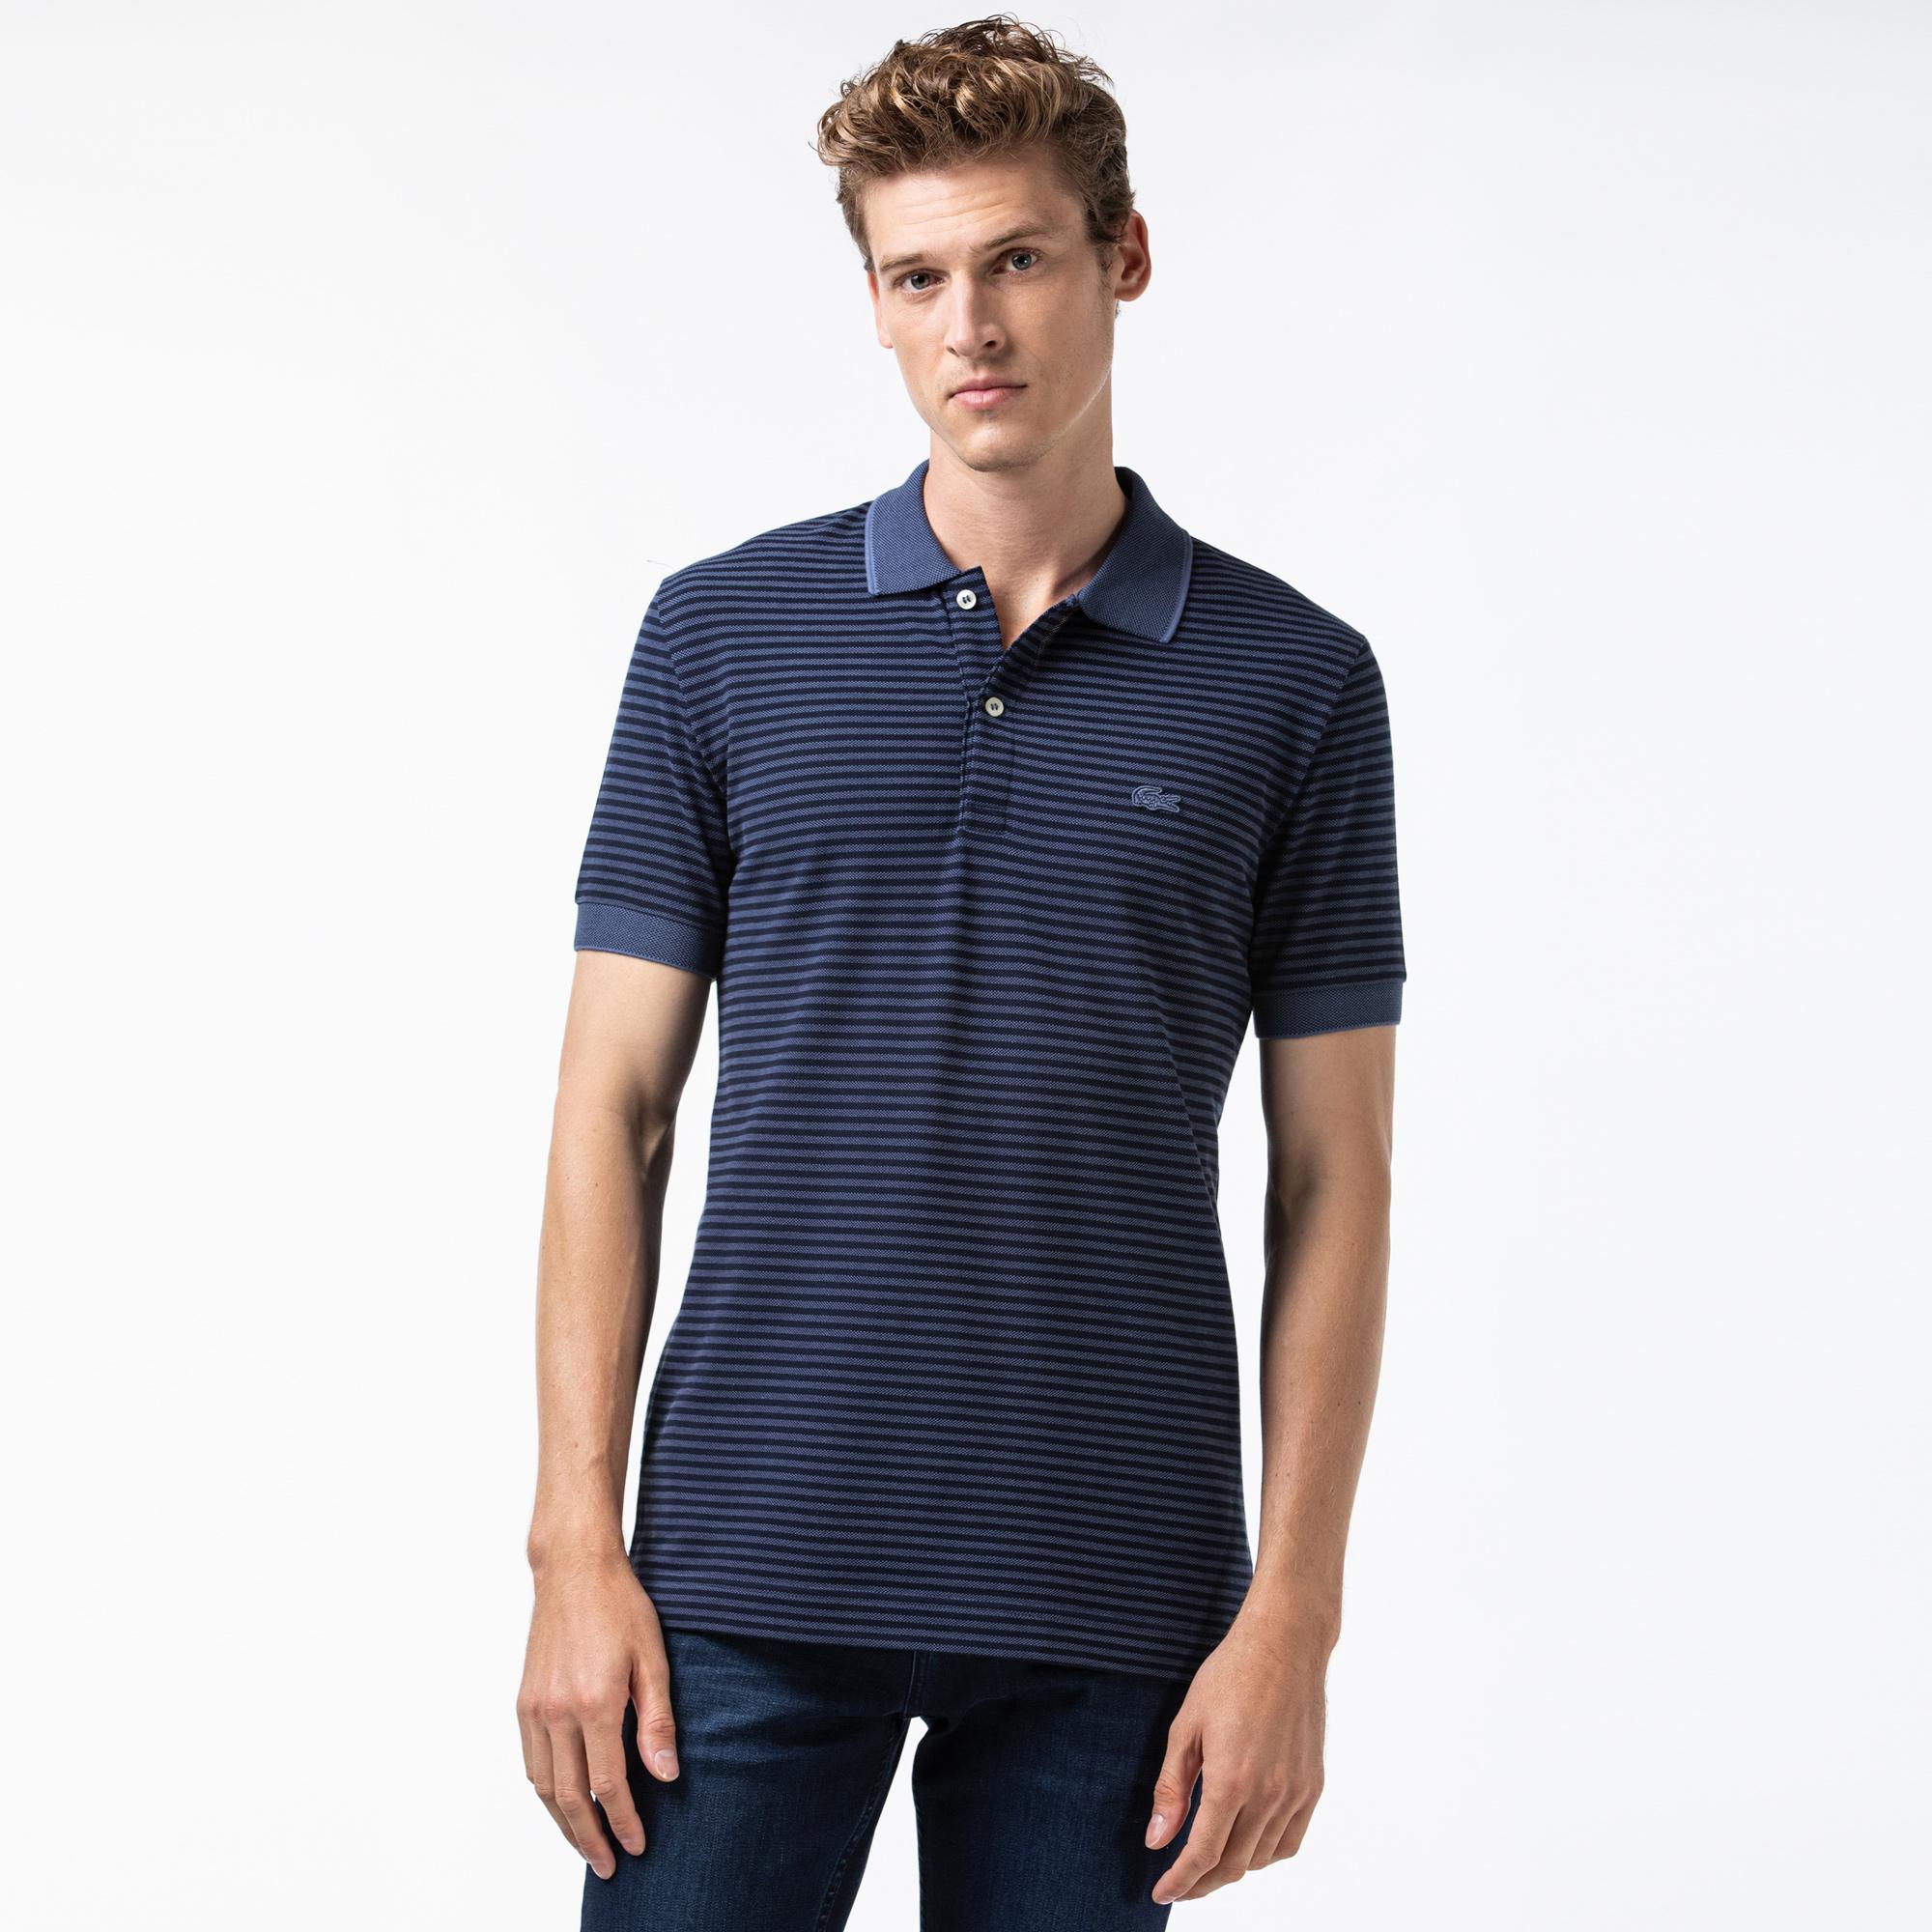 Lacoste Męska Koszulka Polo Regular Fit